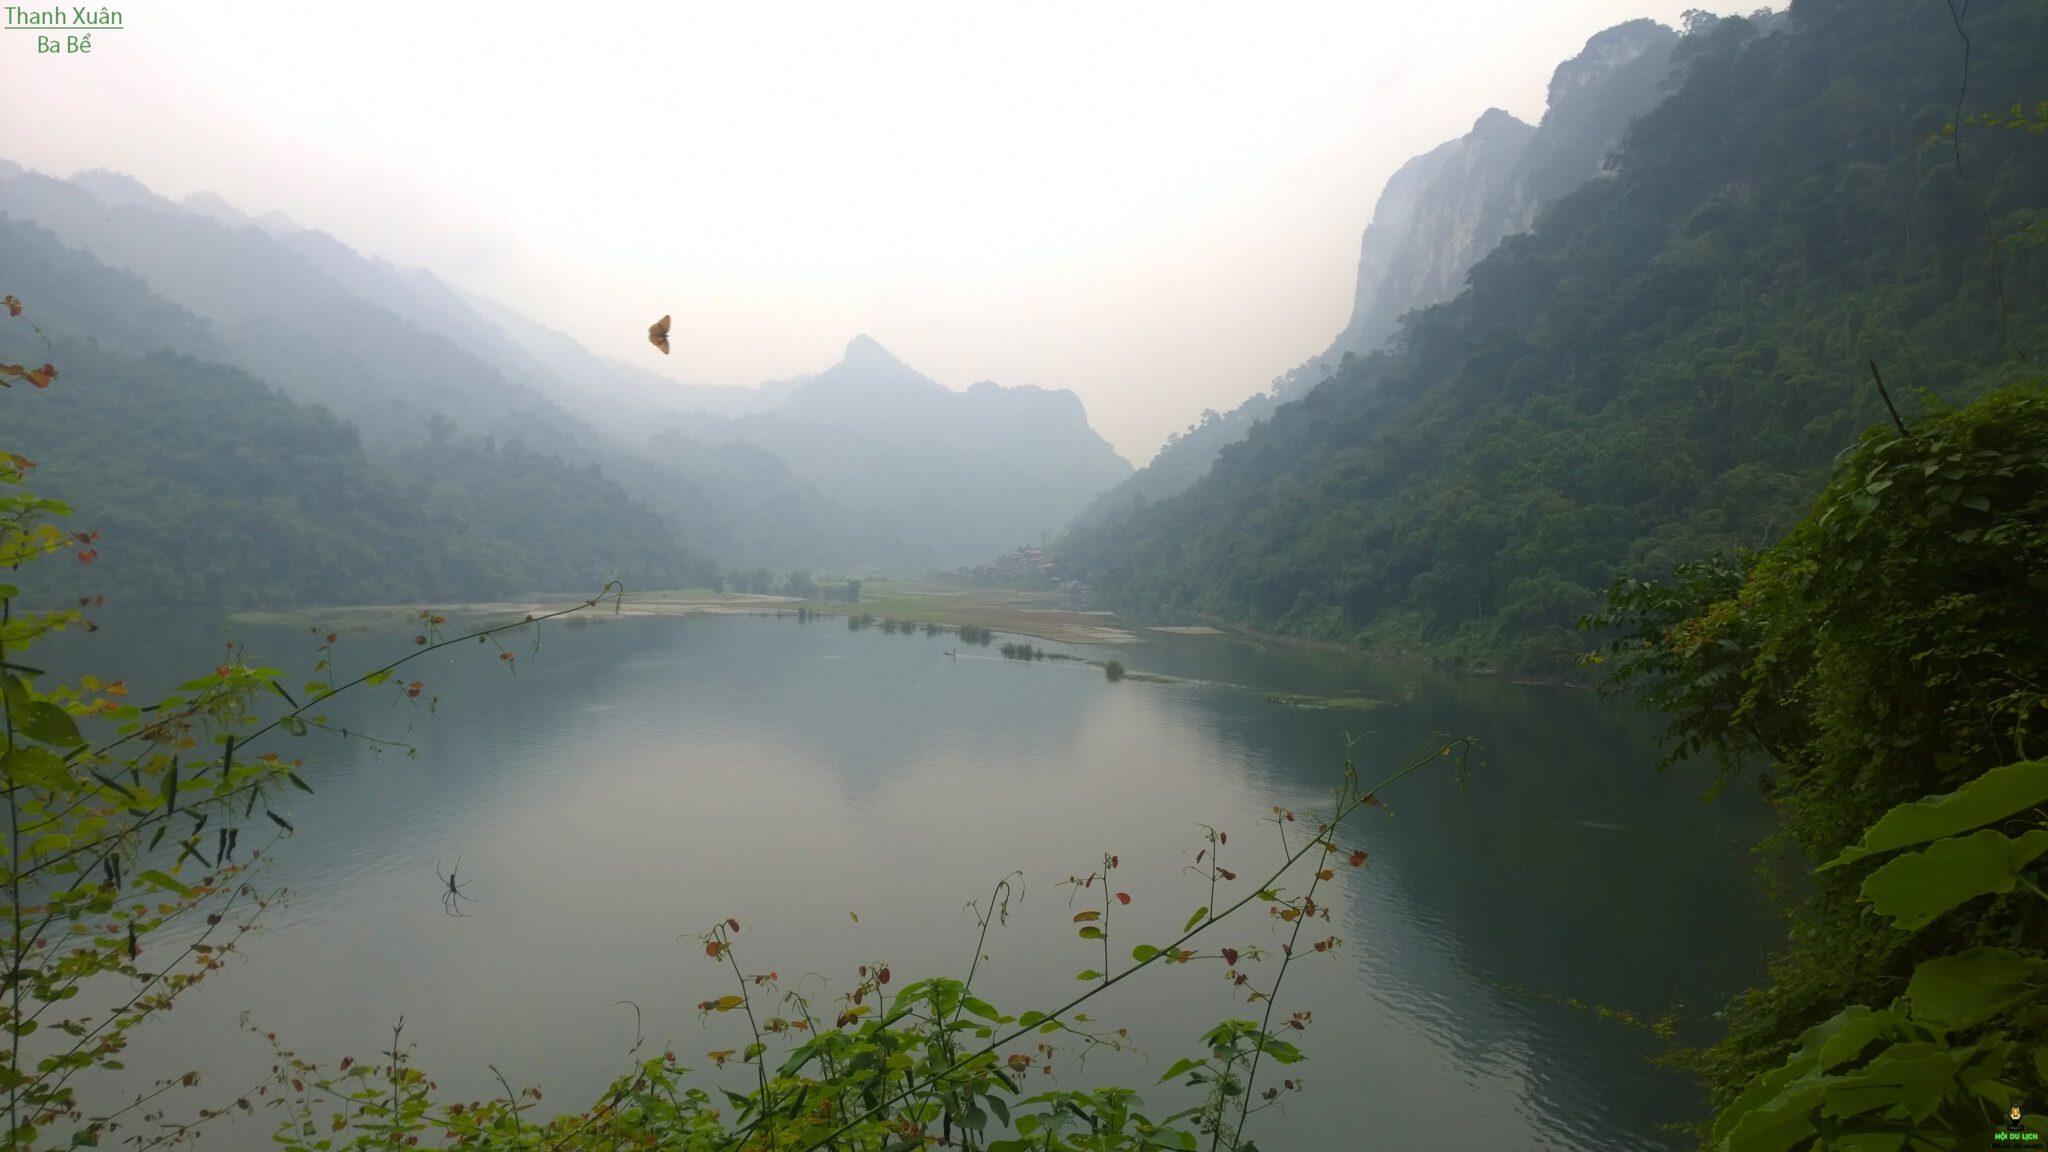 Thả trọn hồn mơ trên Hồ Ba Bể